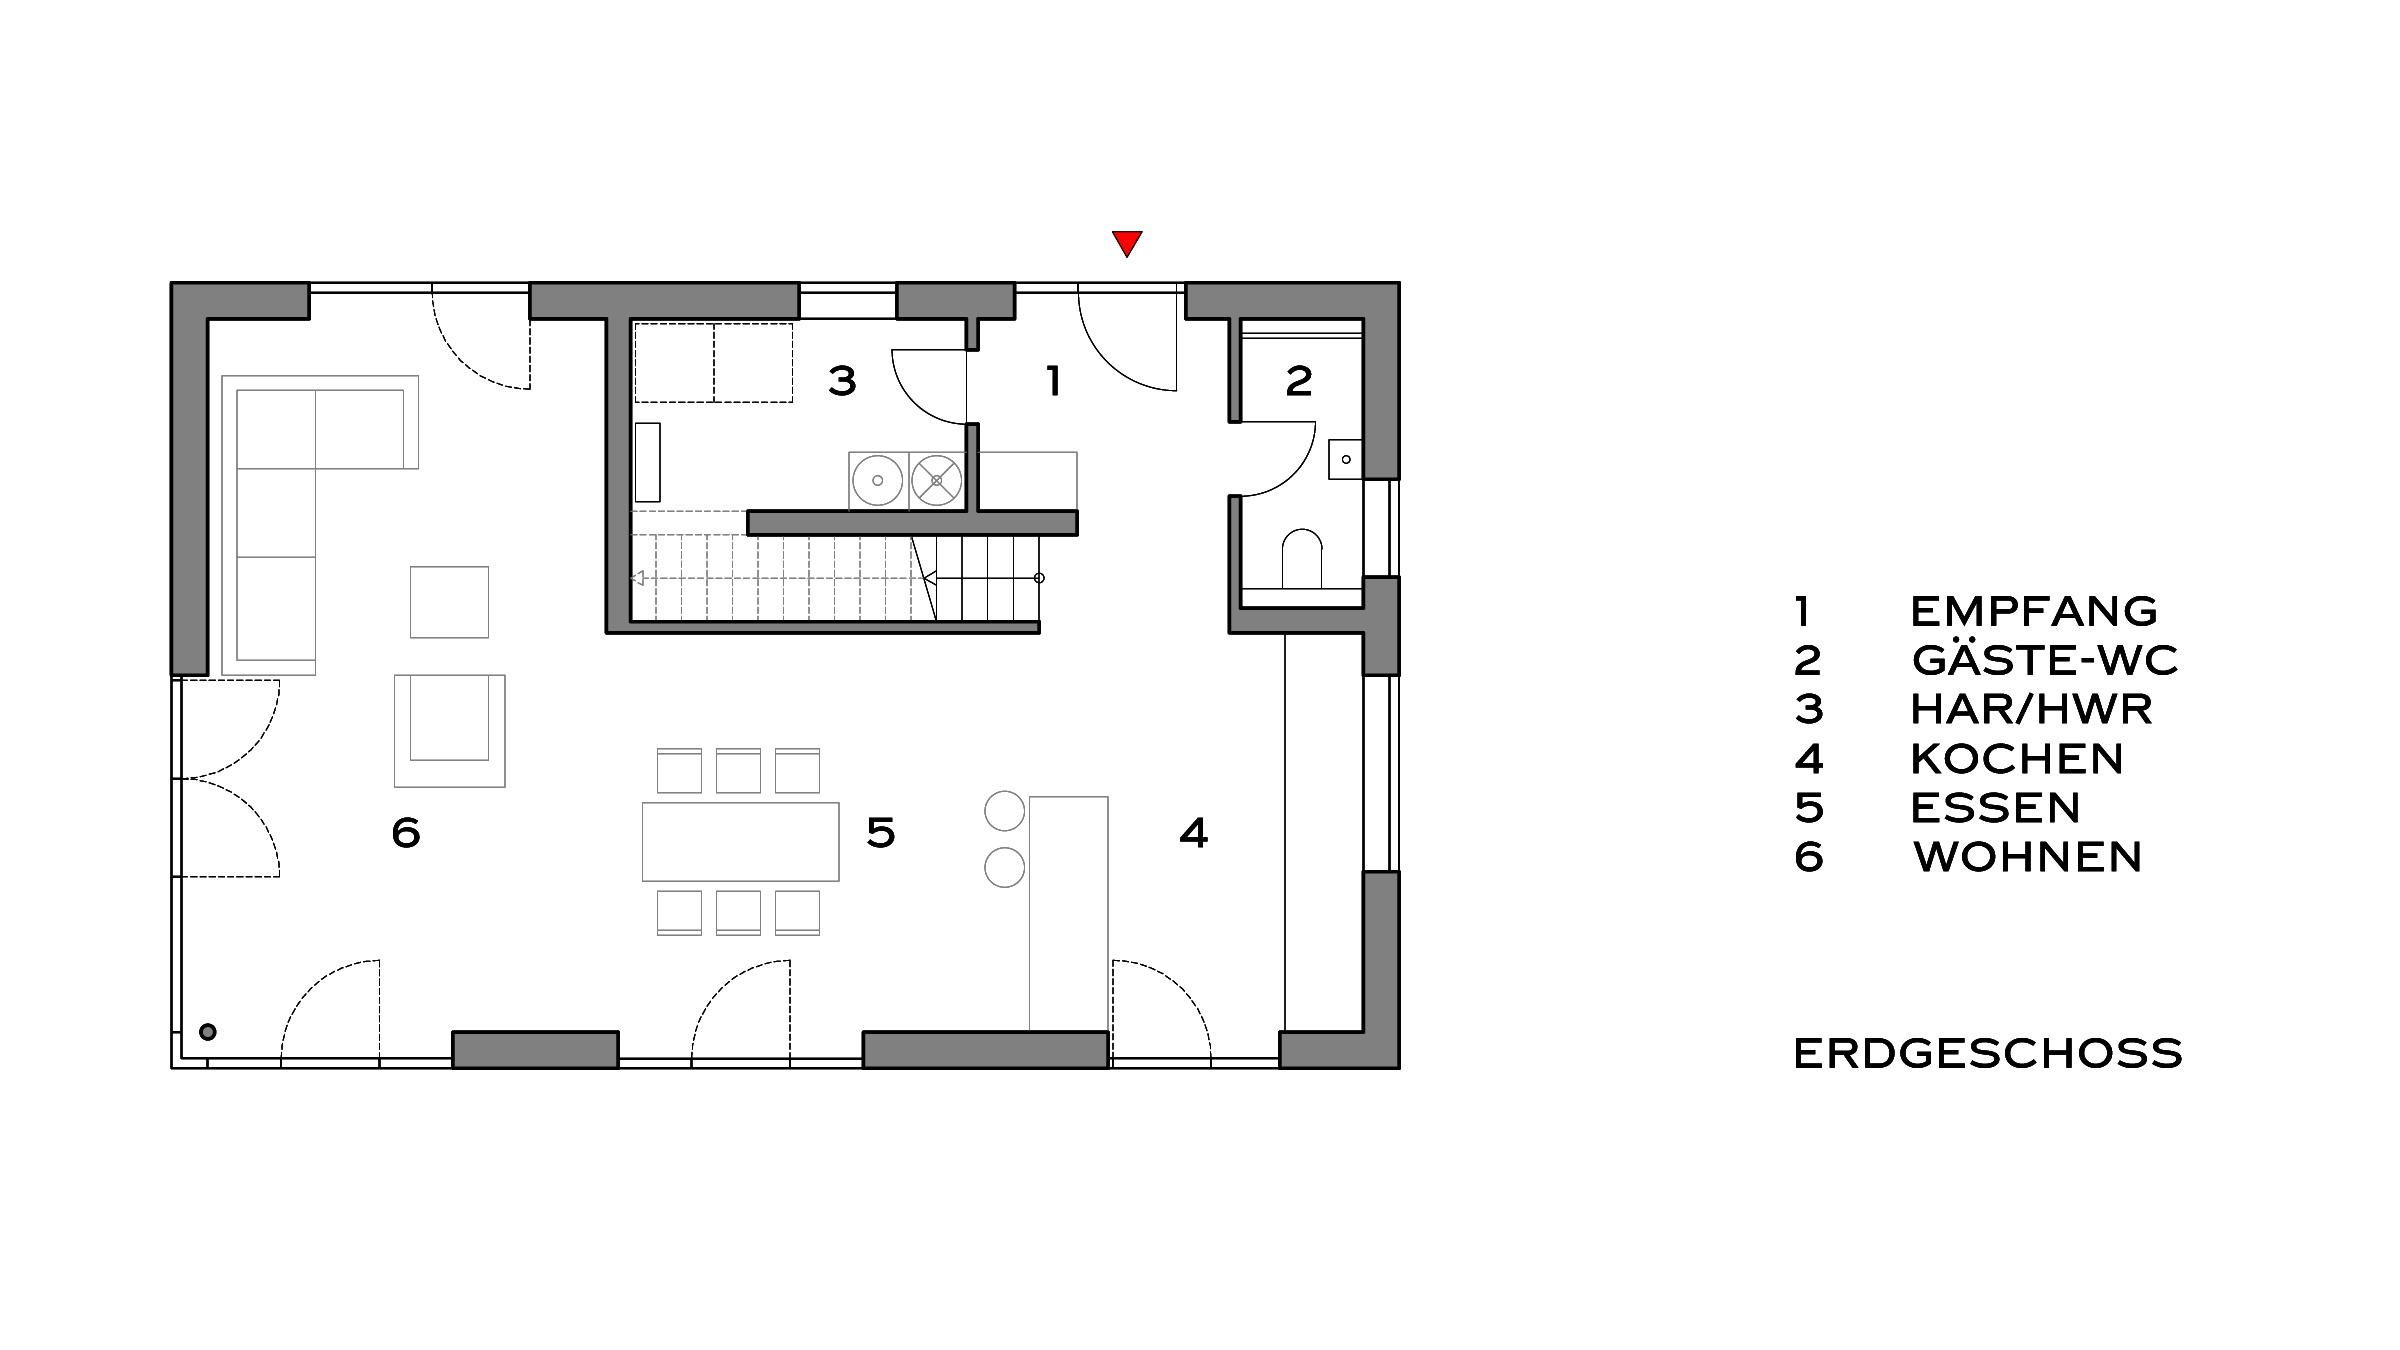 Einfamilienhaus mit Satteldach Grundriss Erdgeschoss